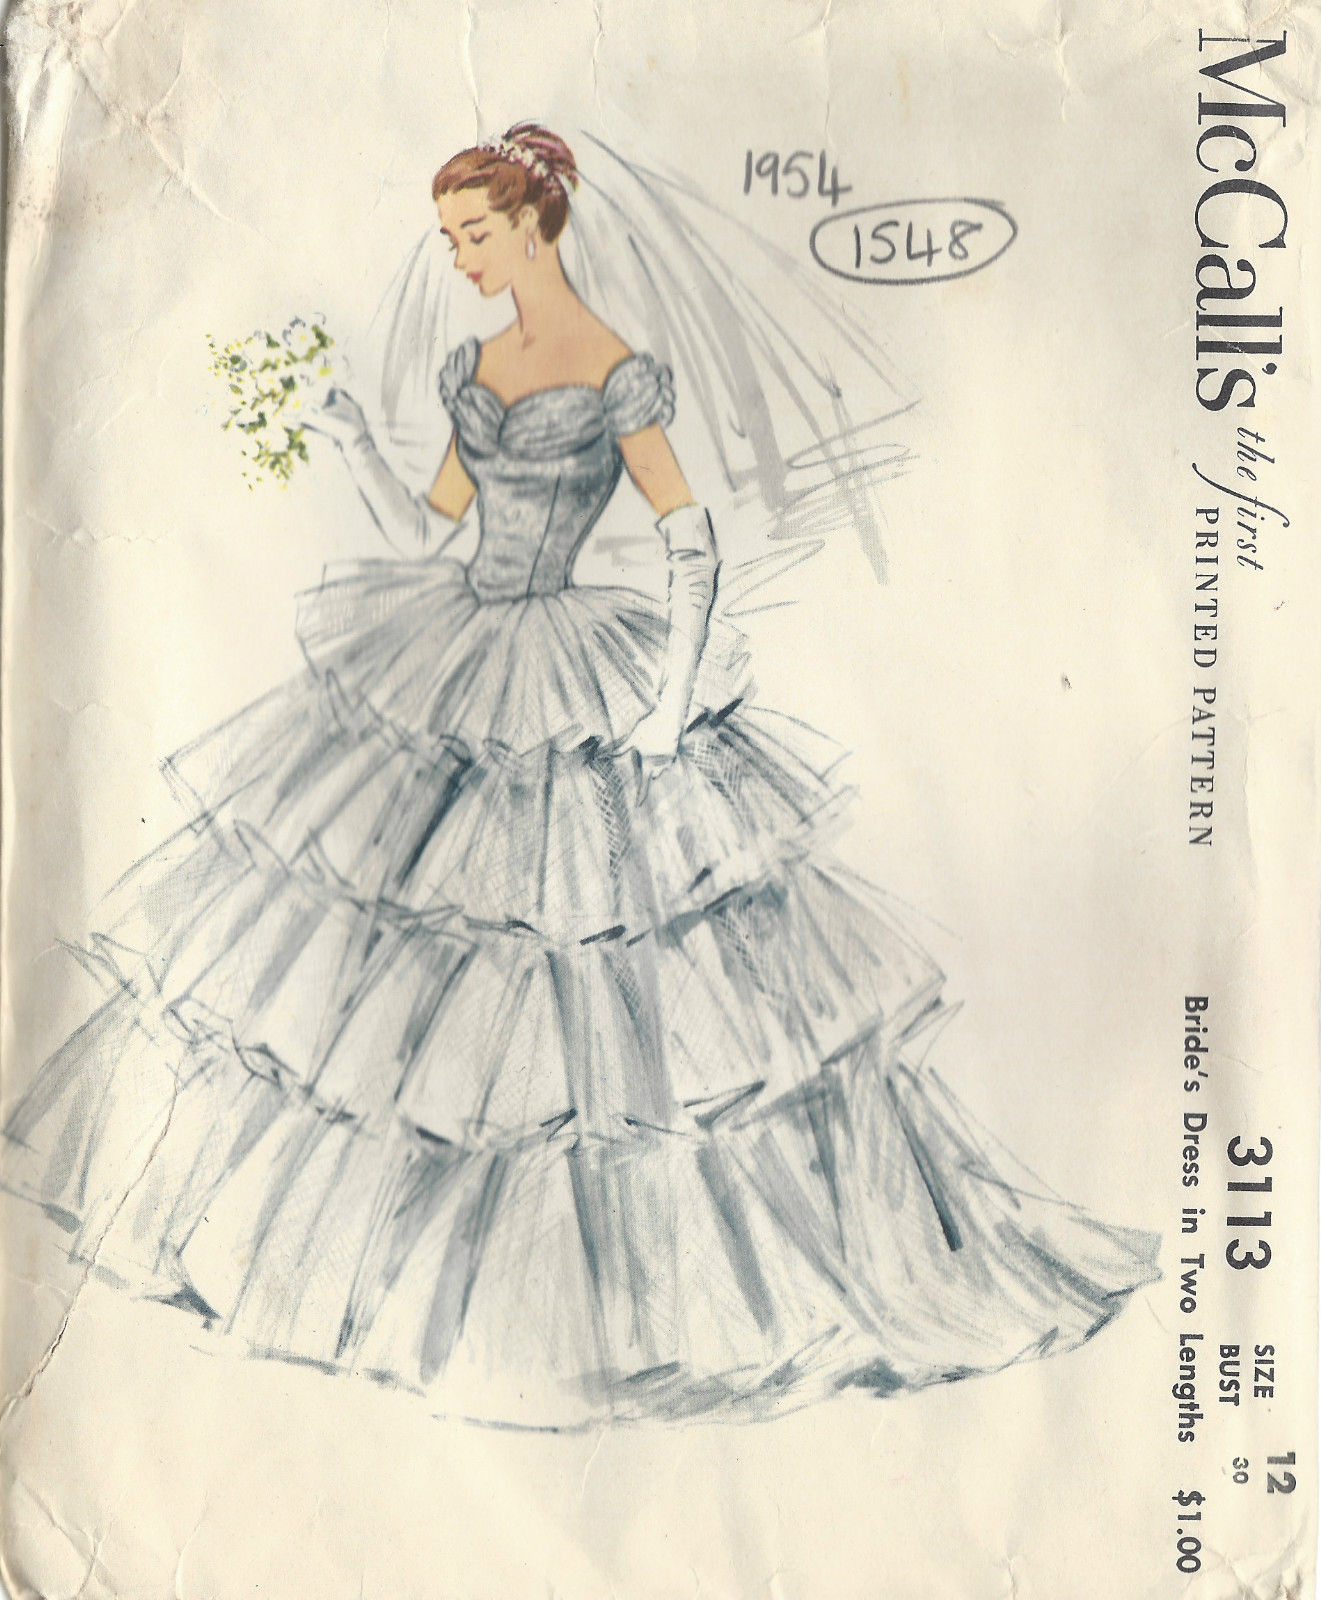 1954 Vintage Sewing Pattern B30 Wedding Brides Dress 1549